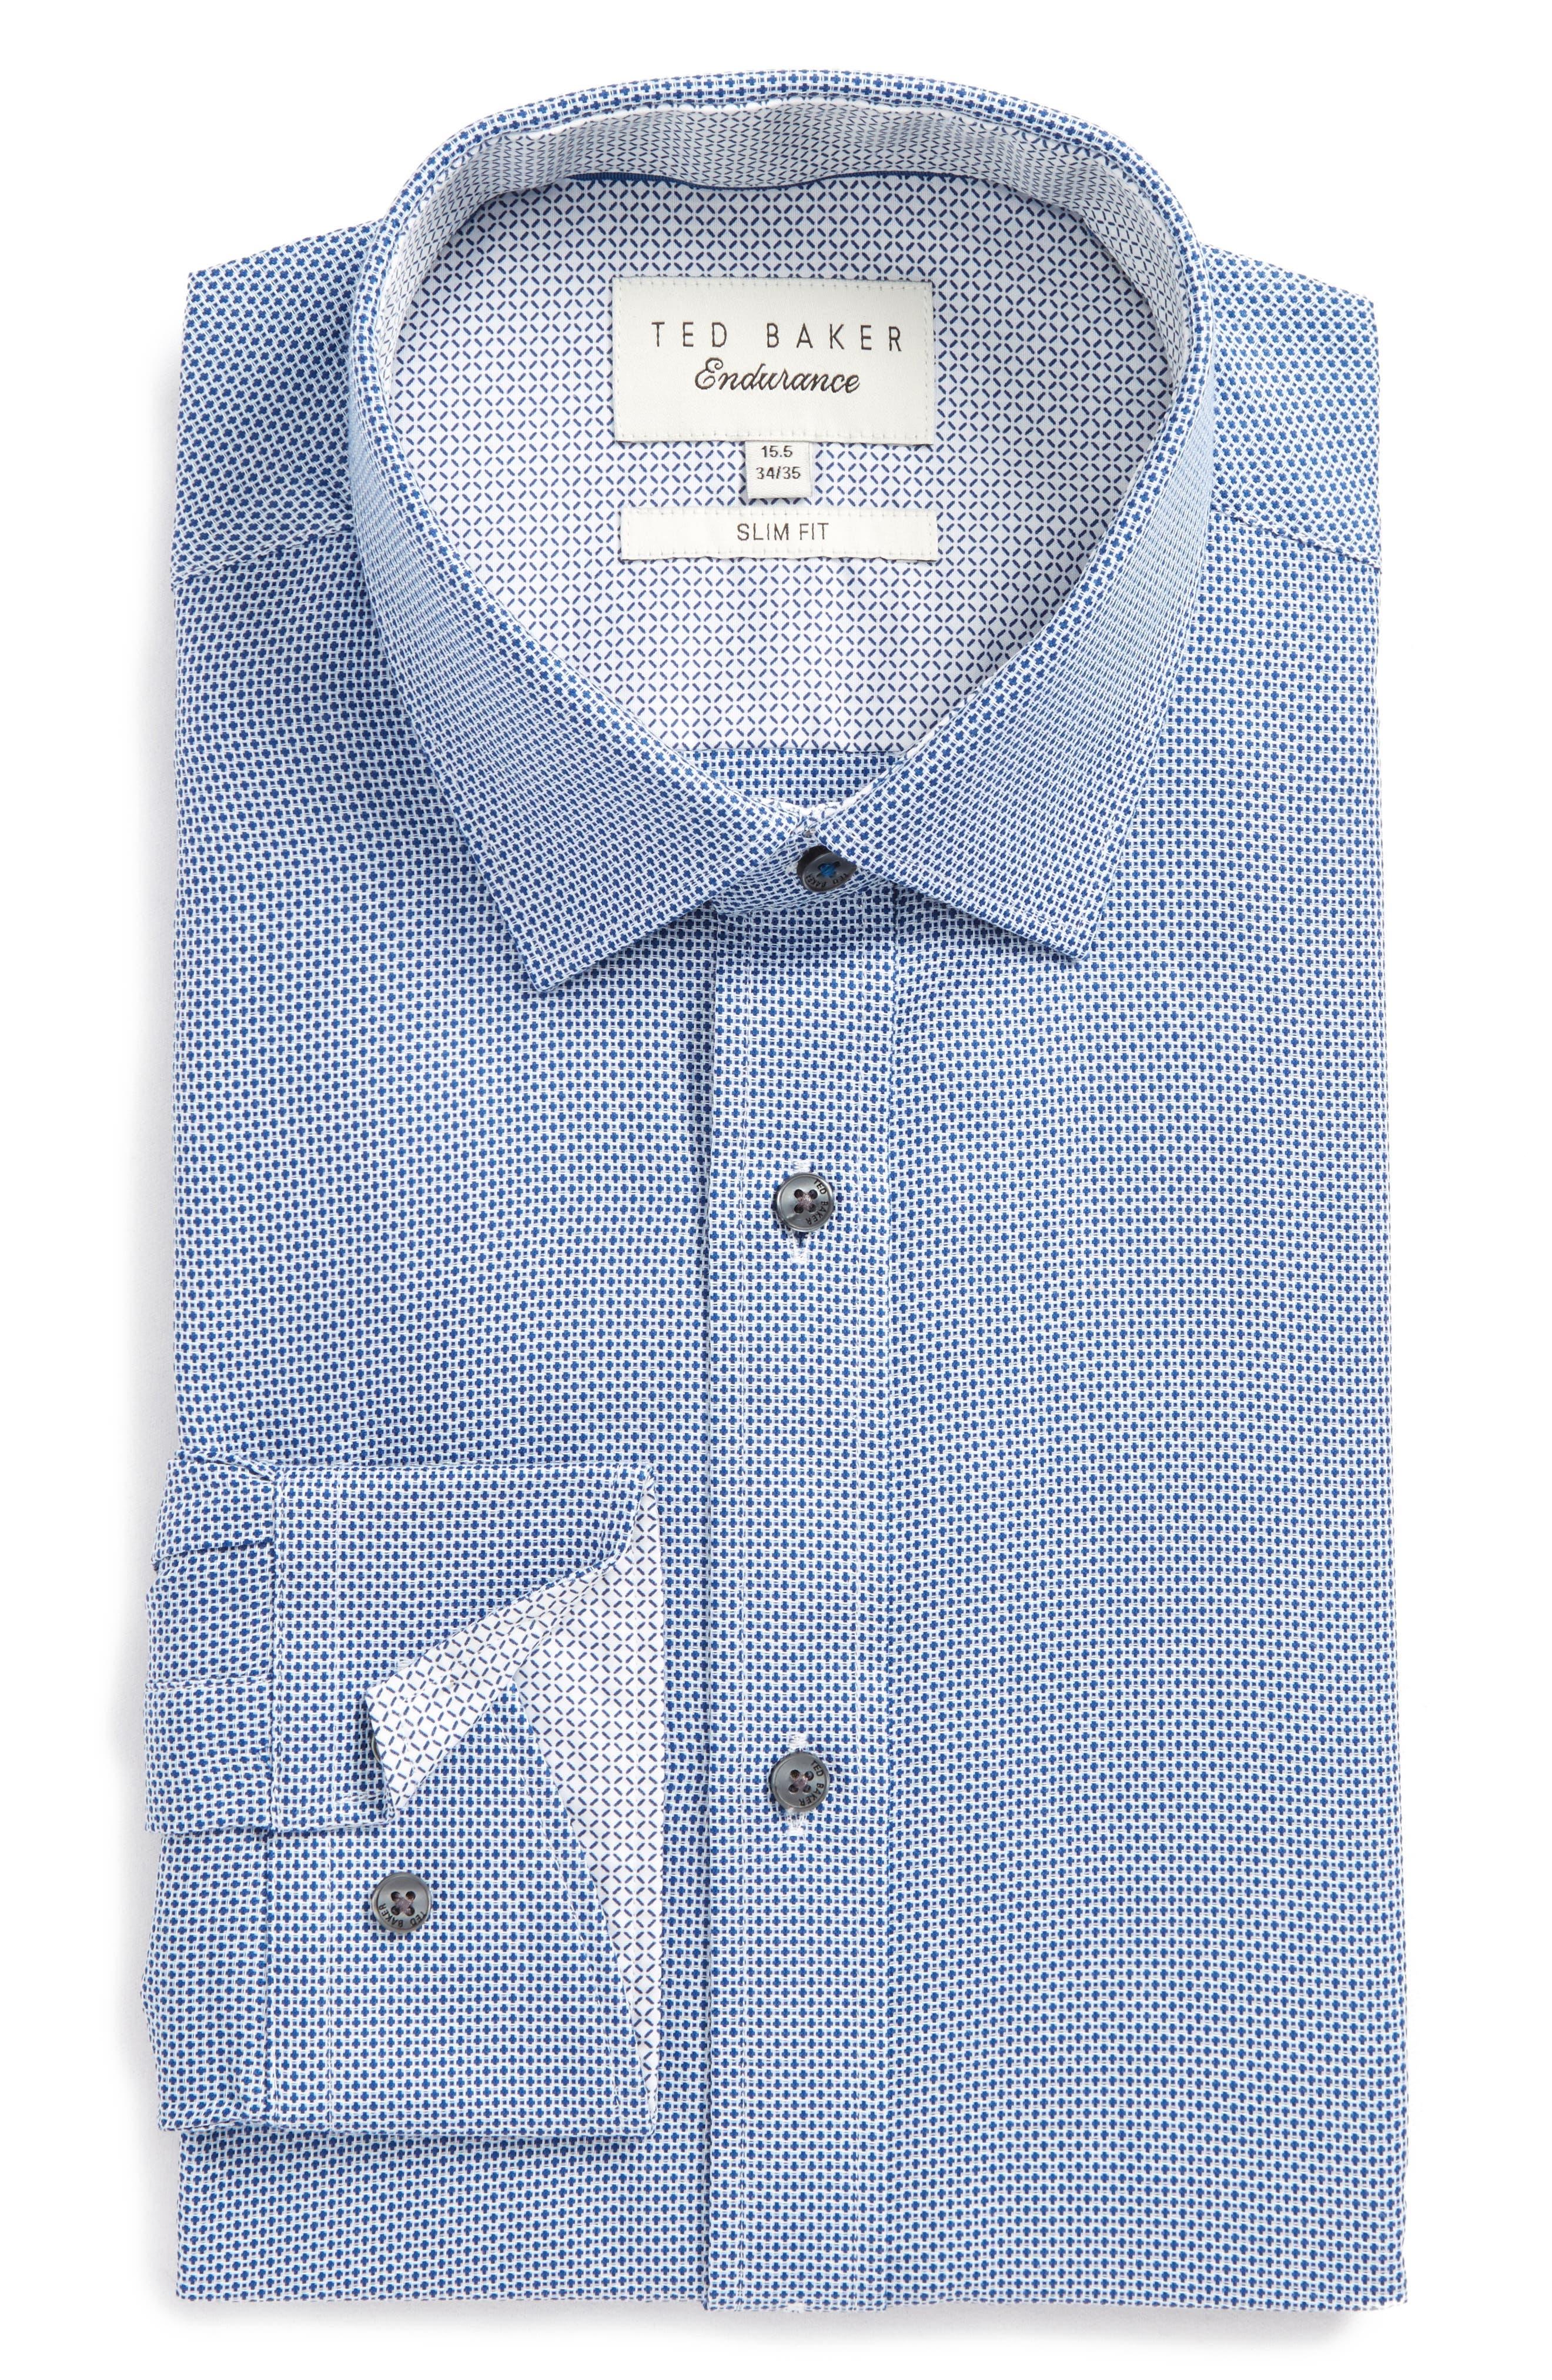 Alternate Image 1 Selected - Ted Baker London Slim Fit Geometric Dress Shirt